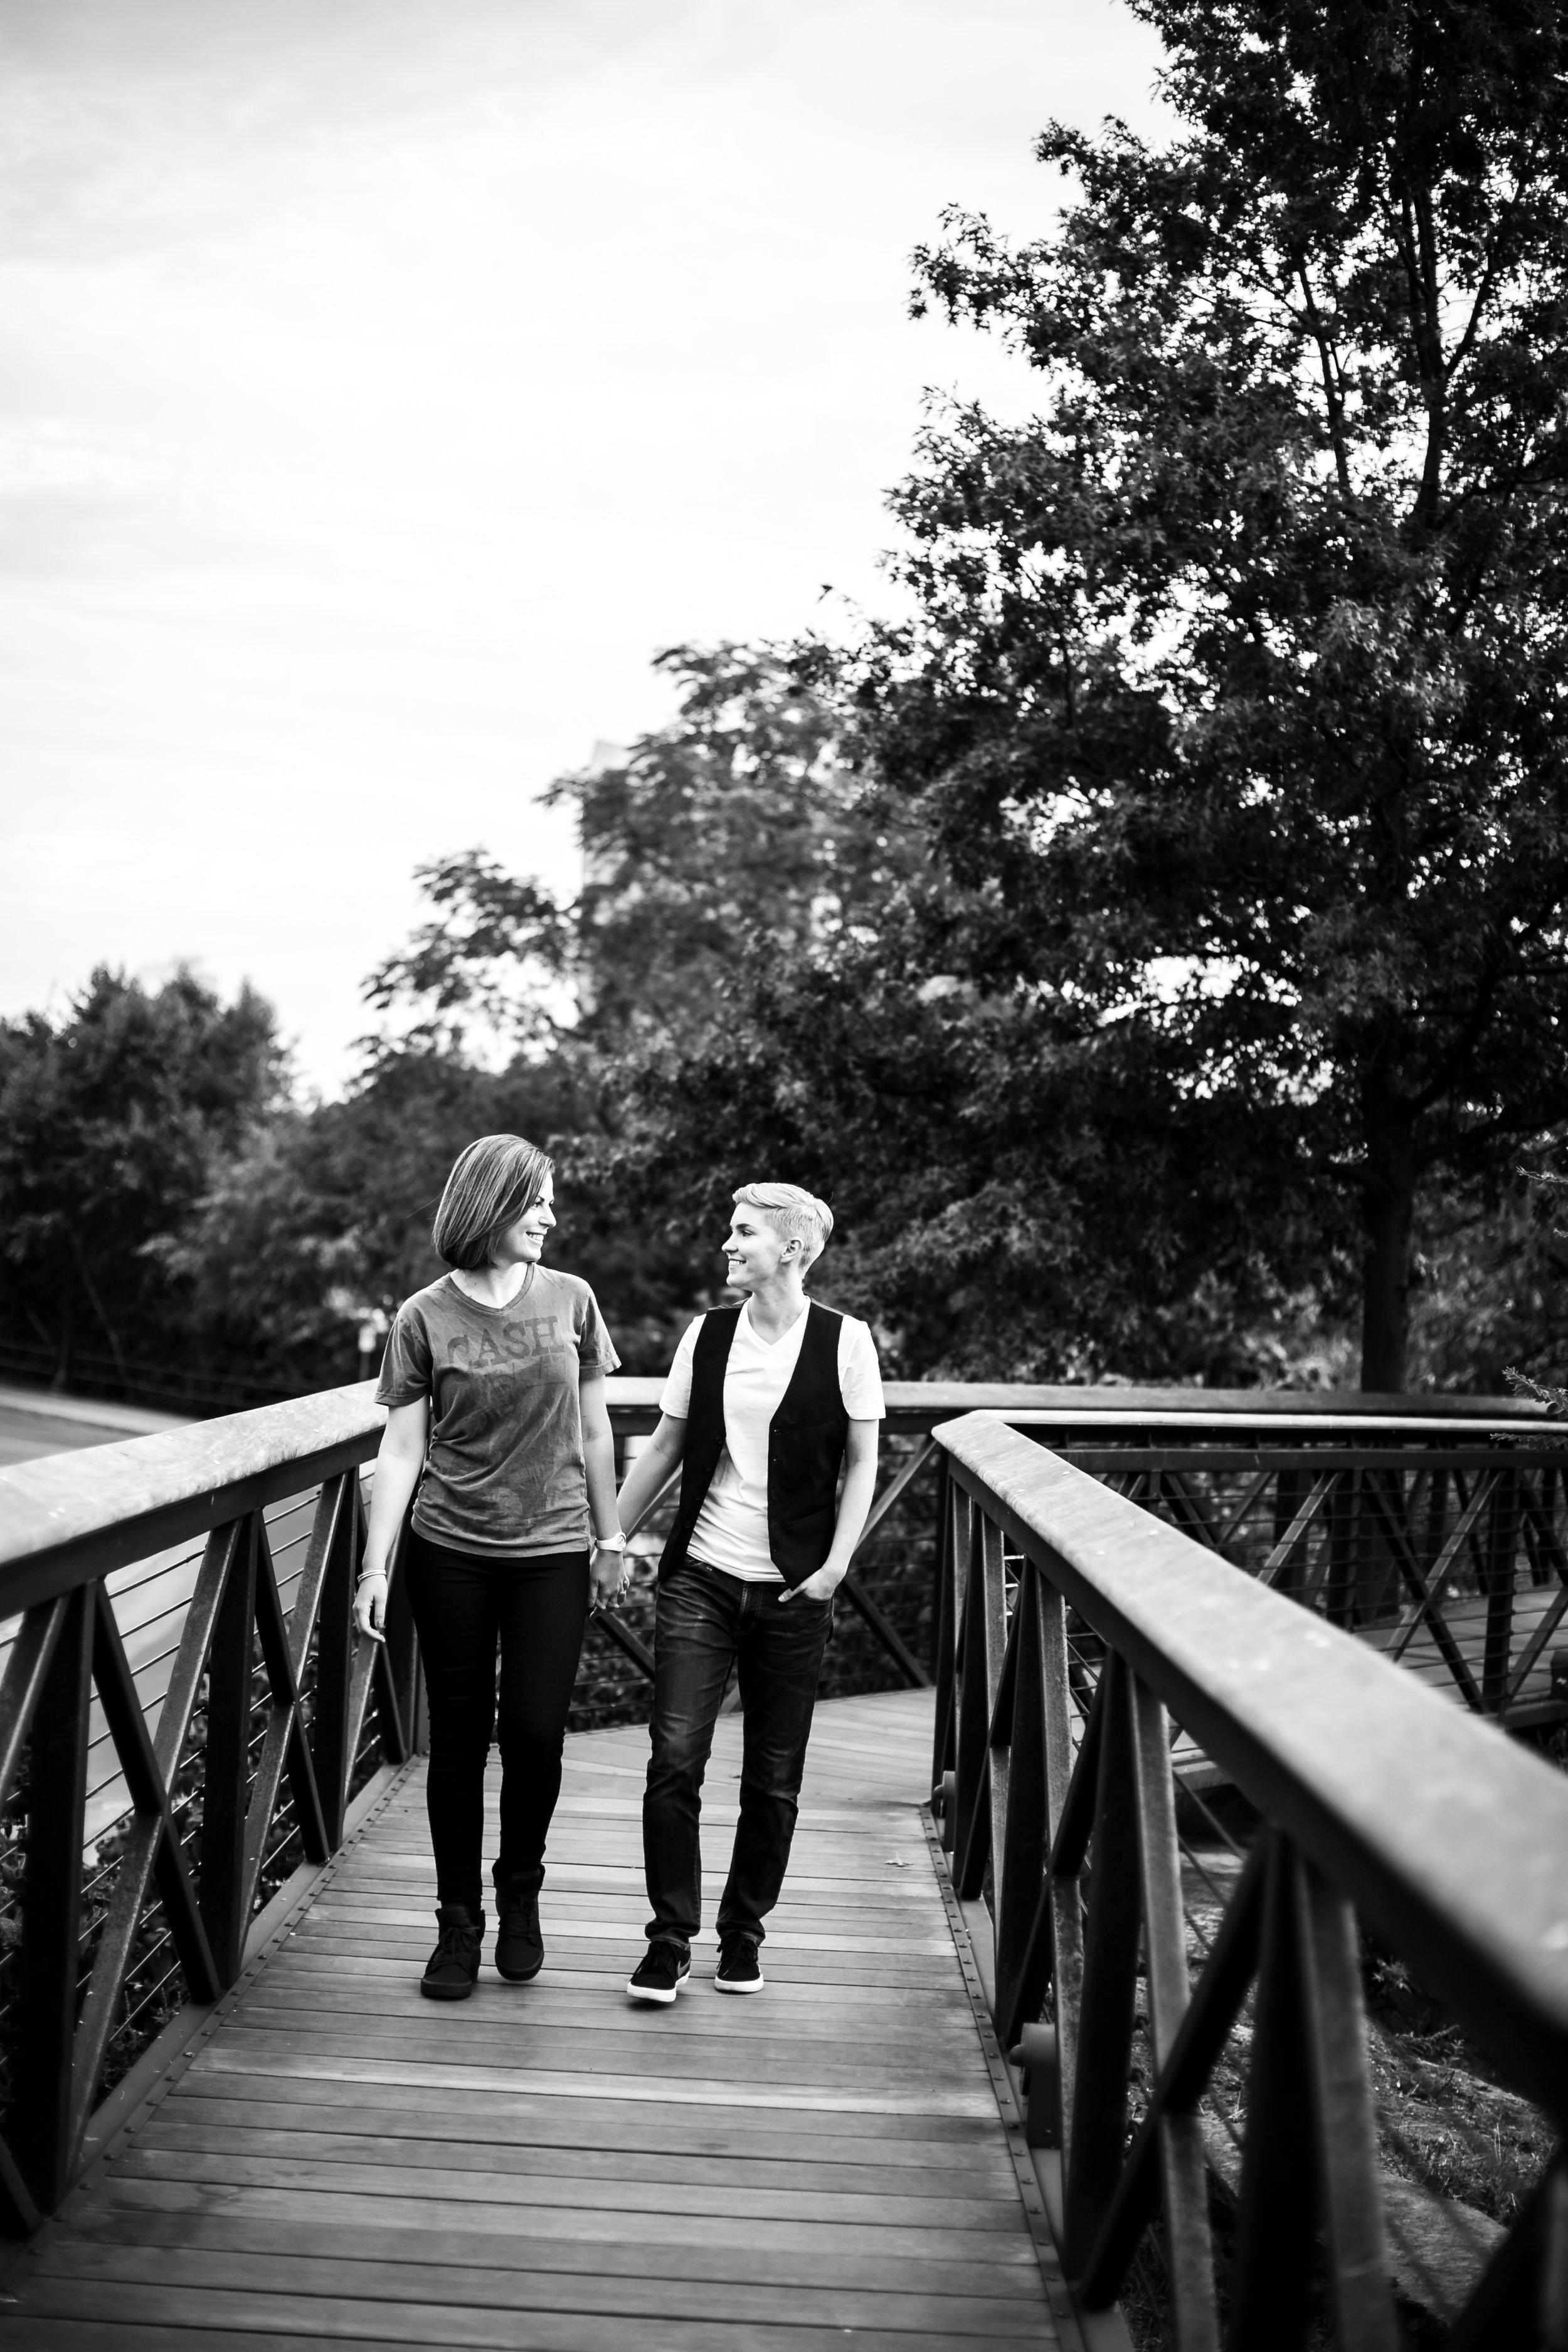 Philadelphia Queer Engagement Session by Lesbian Photographer Amanda Swiger 16